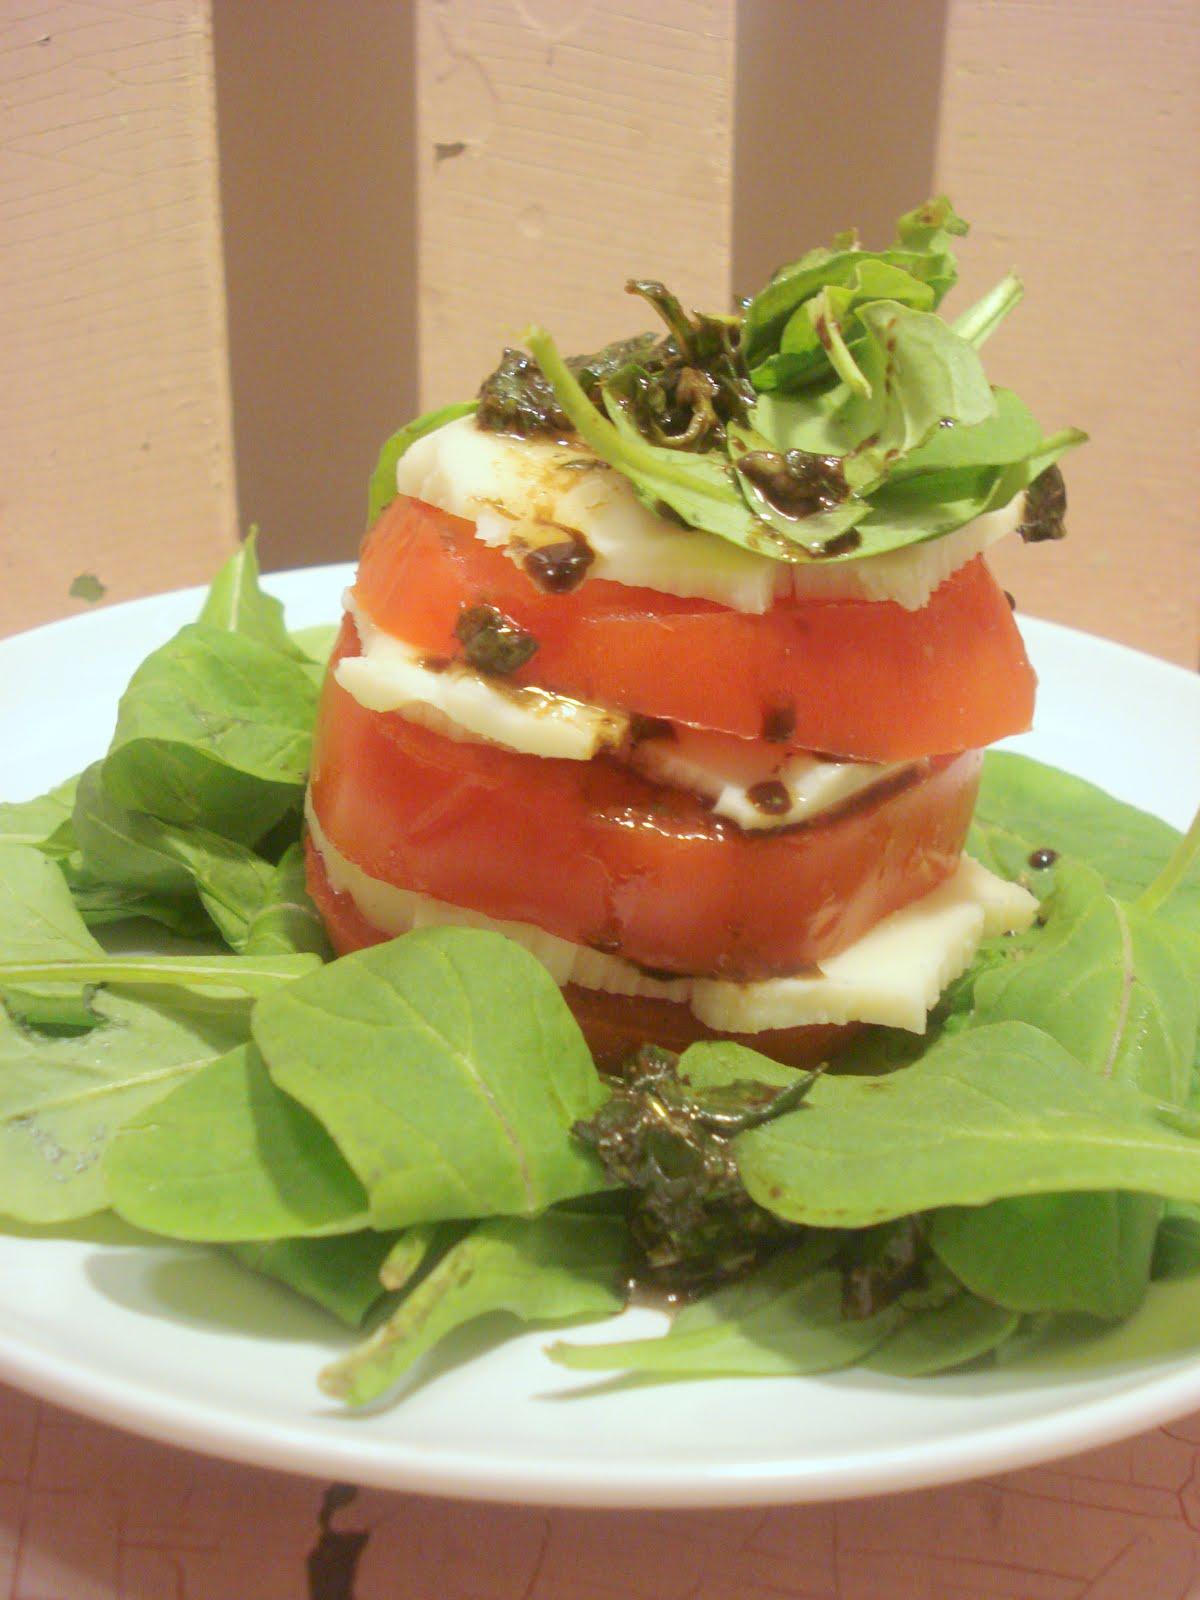 Dame Good Eats: Tomato, Mozzarella and Arugula Towers